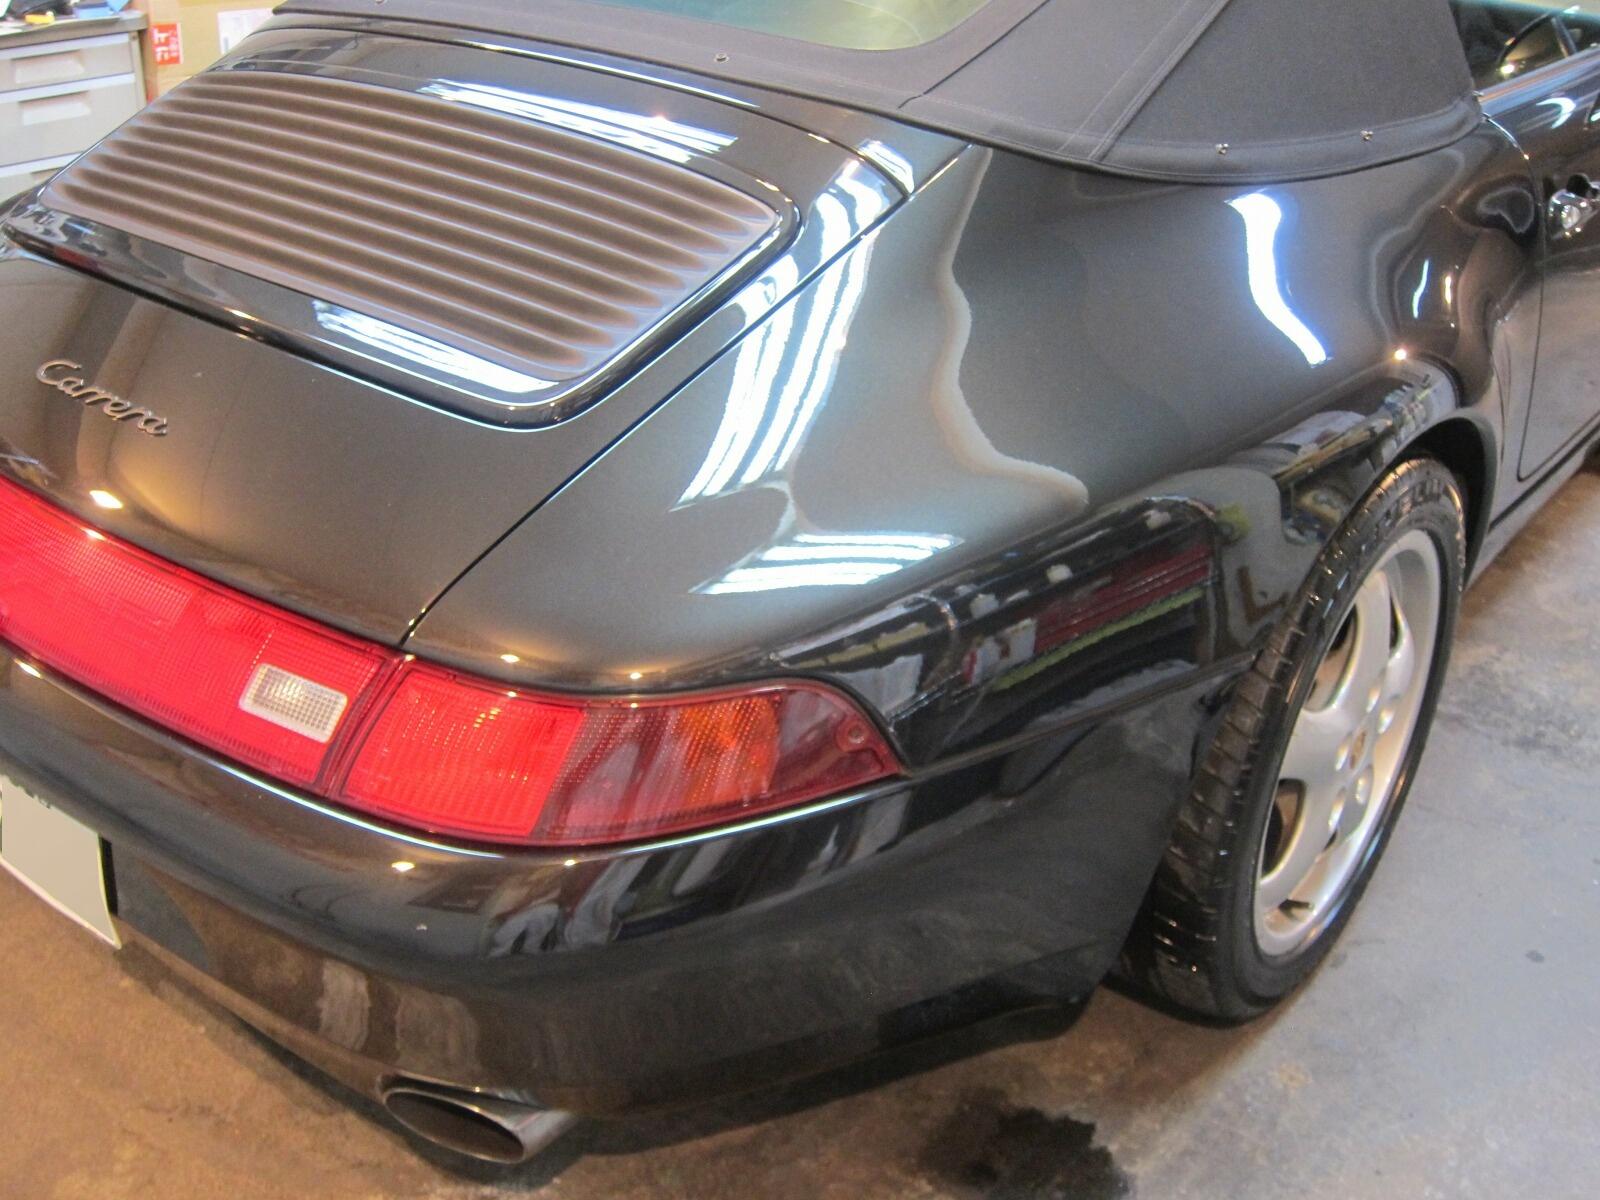 20150909-porsche-911-carrera-cabriolet-14